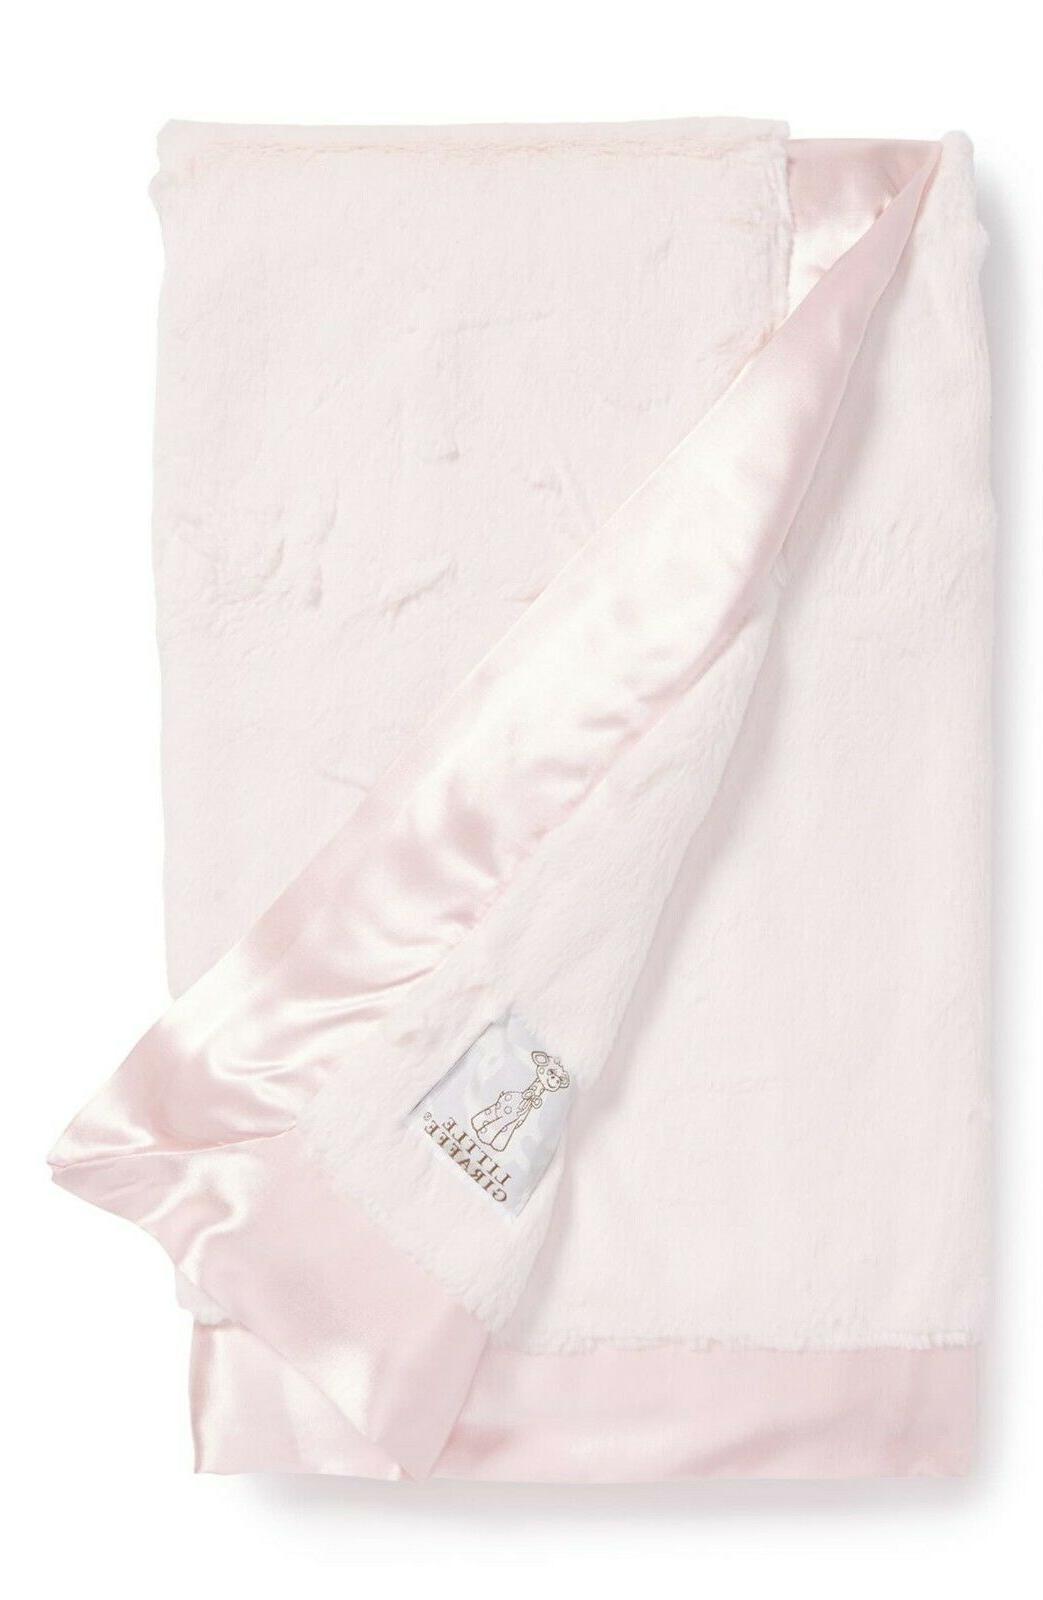 LITTLE GIRAFFE Luxe Baby Blanket